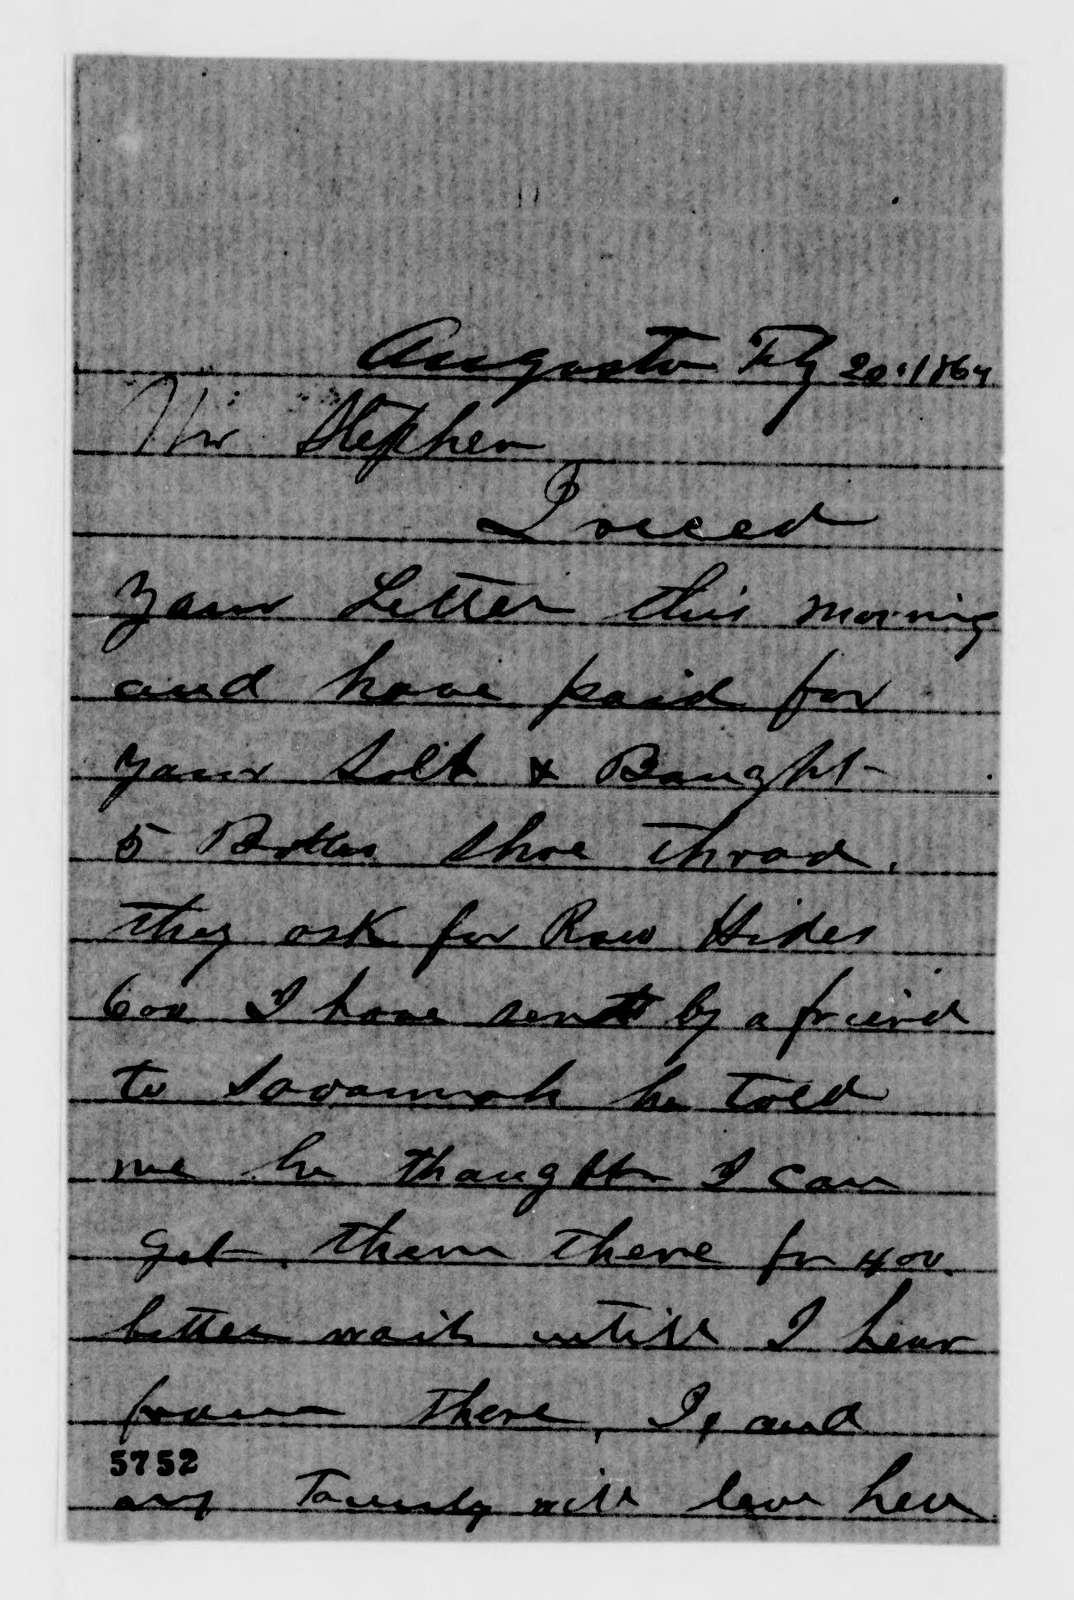 Alexander Hamilton Stephens Papers: General Correspondence, 1784-1886; 1863, Nov. 3-1864, Apr. 7